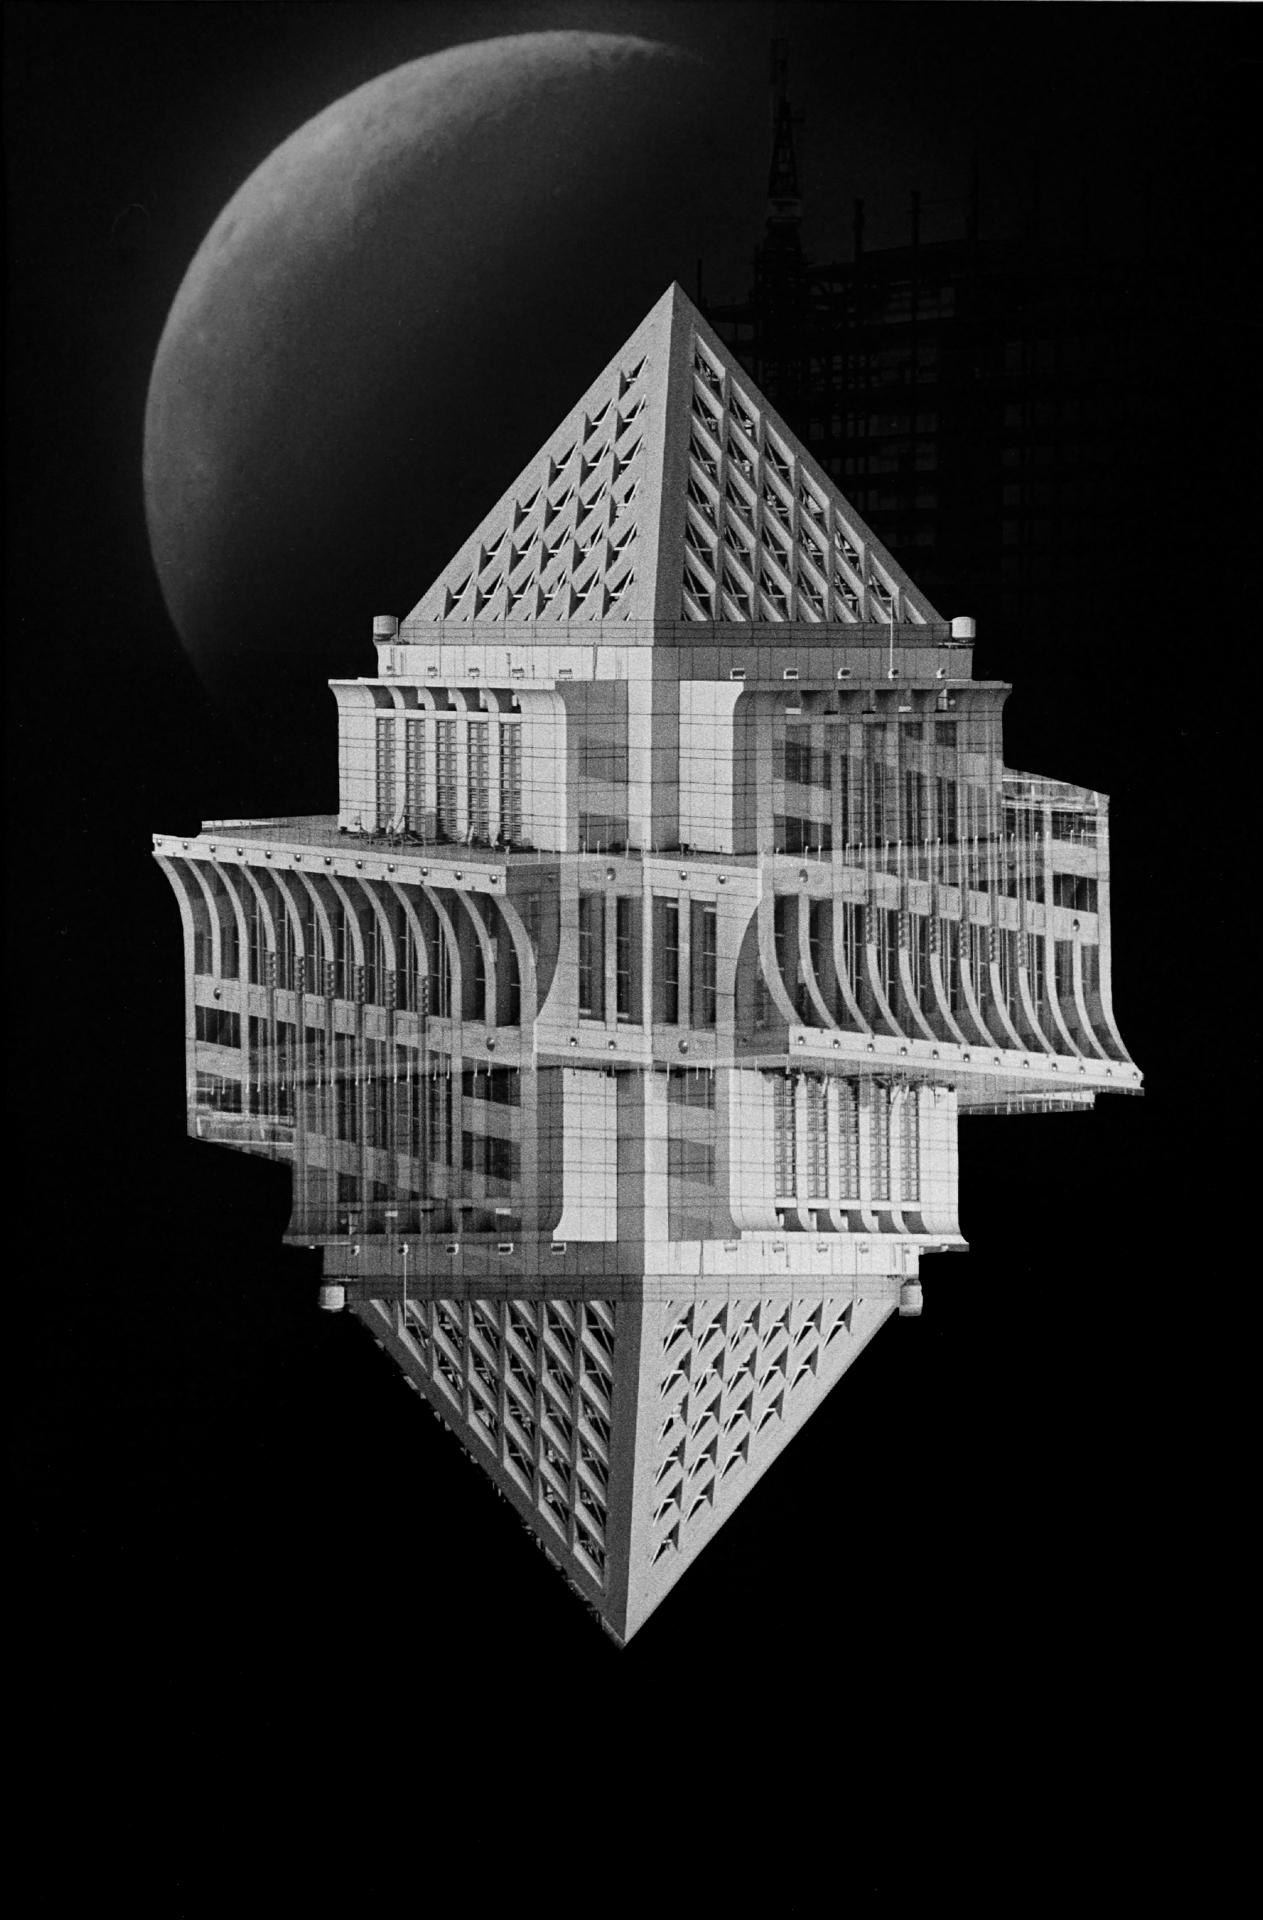 Space Tesseract Kazoo | Copyright © David Allen